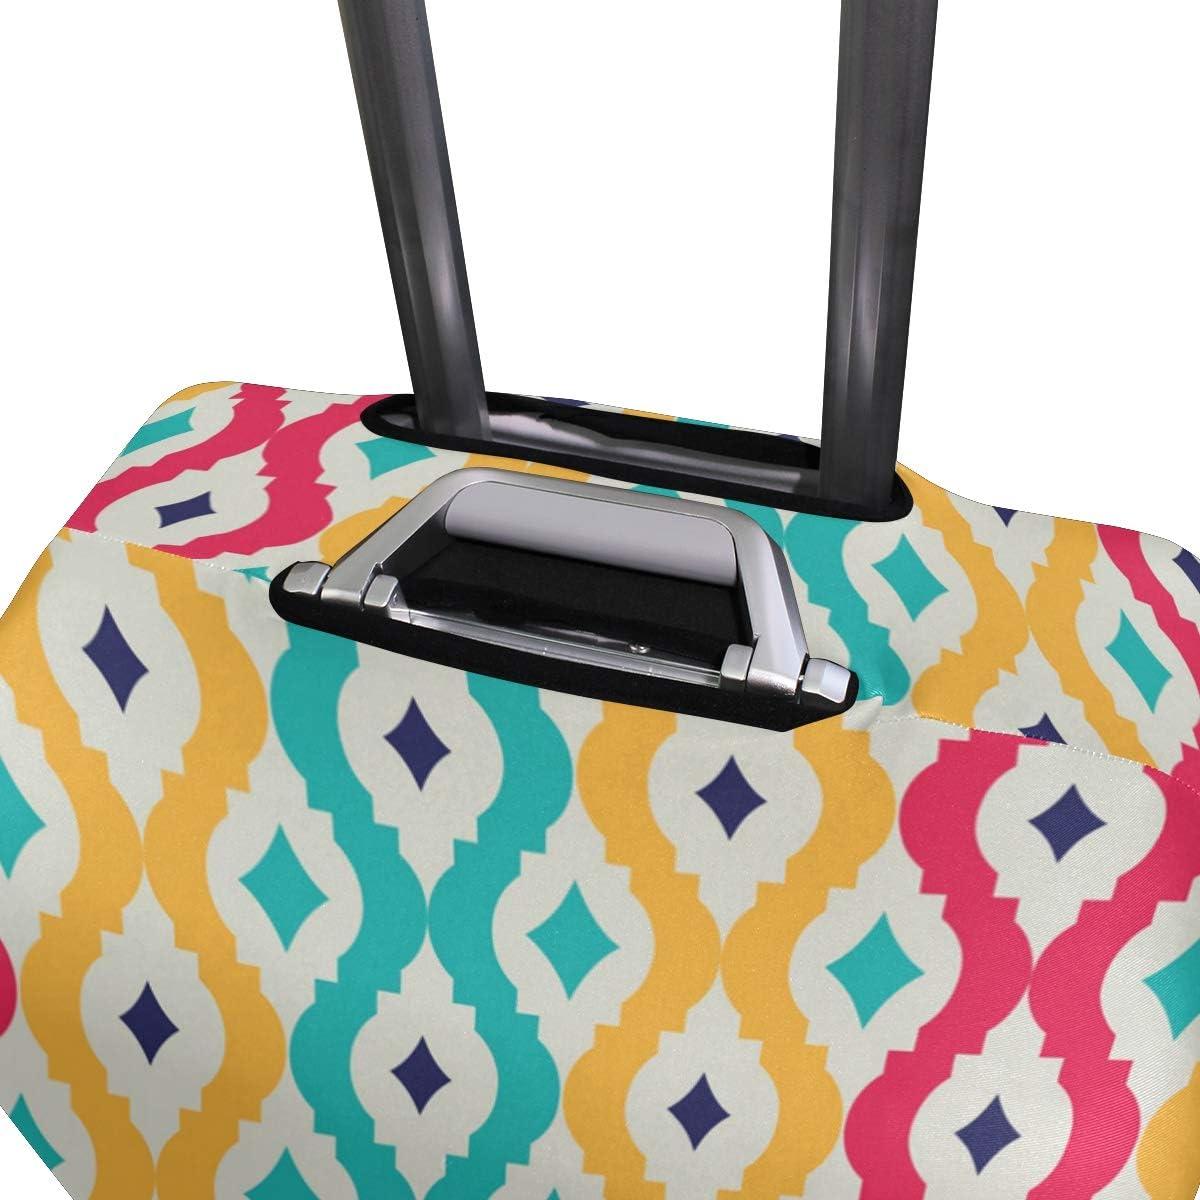 FANTAZIO Colorful Tangled Lattice Suitcase Protective Cover Luggage Cover